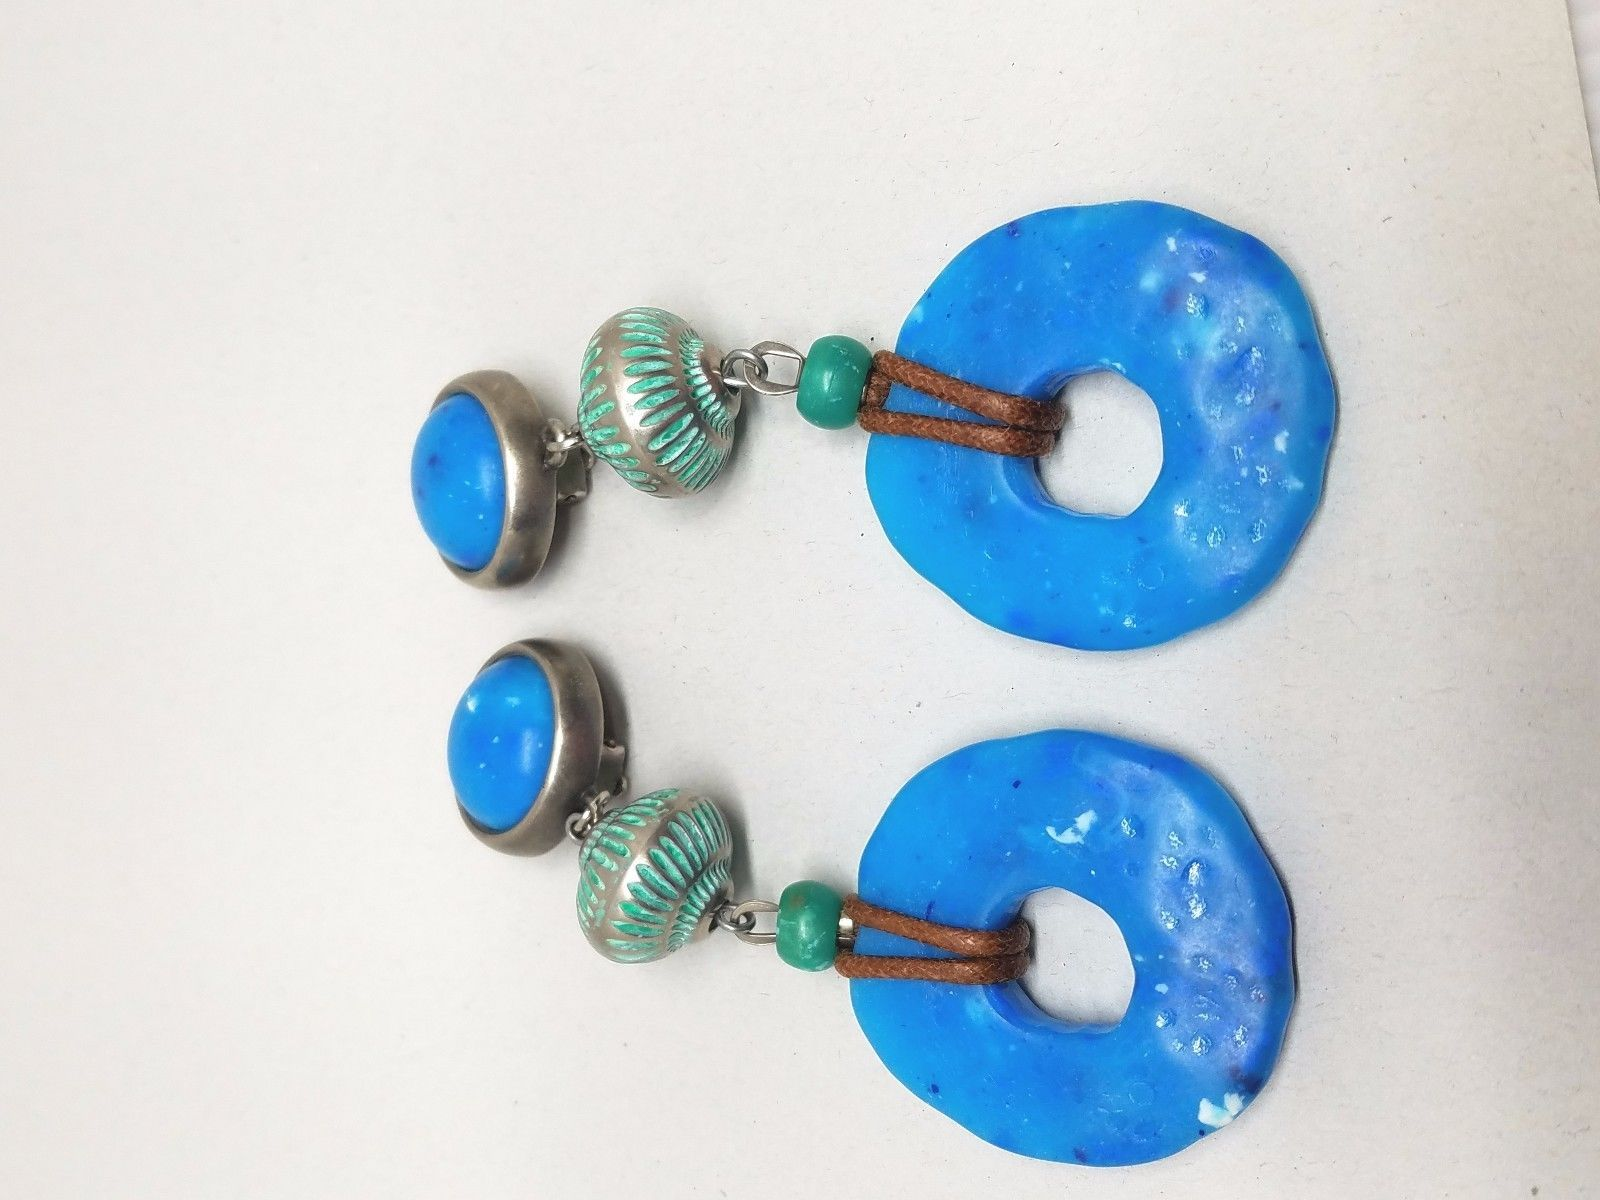 Vintage boho Hippie Earrings Blue Turquoise Color Drop Clipon Earrings